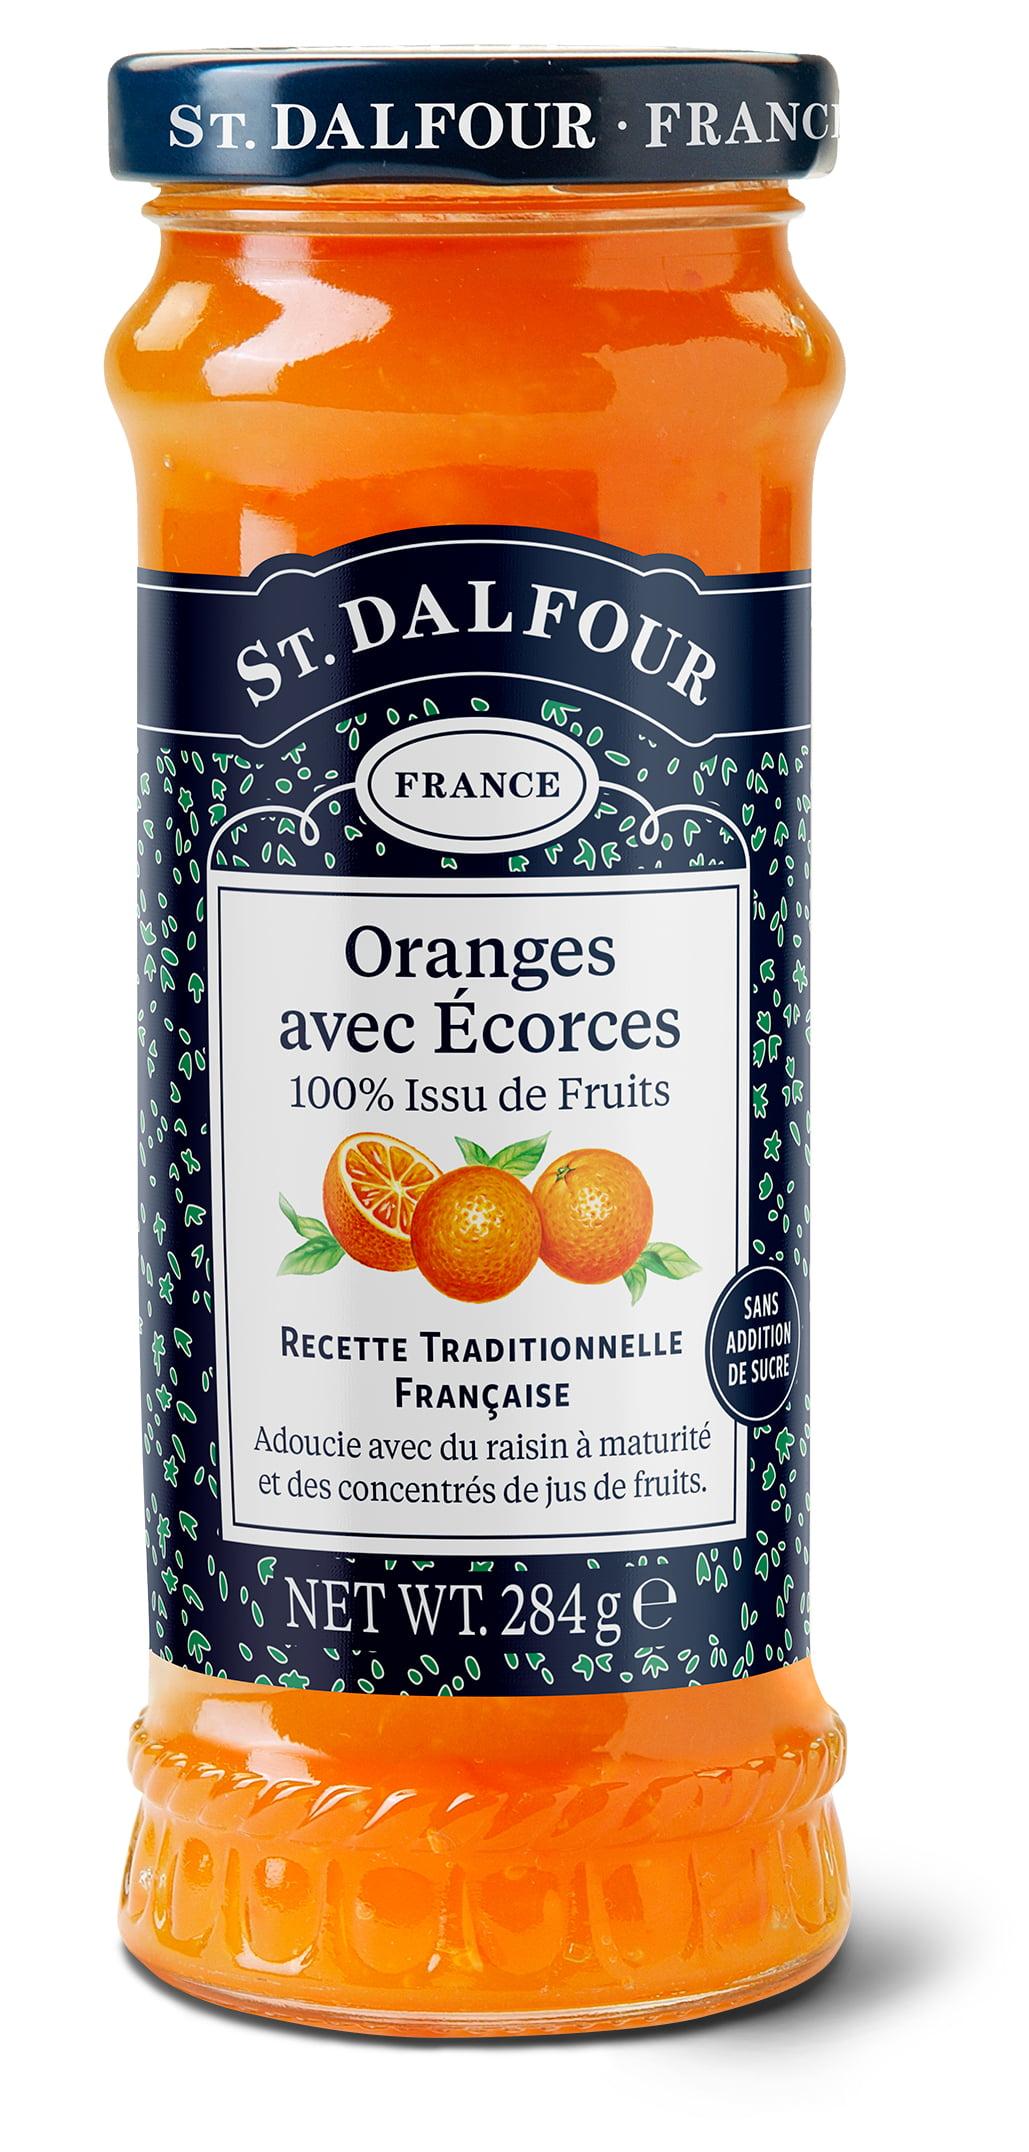 Geleia Francesa St. Dalfour Laranja (Oranges Avec Ecorces) 284g